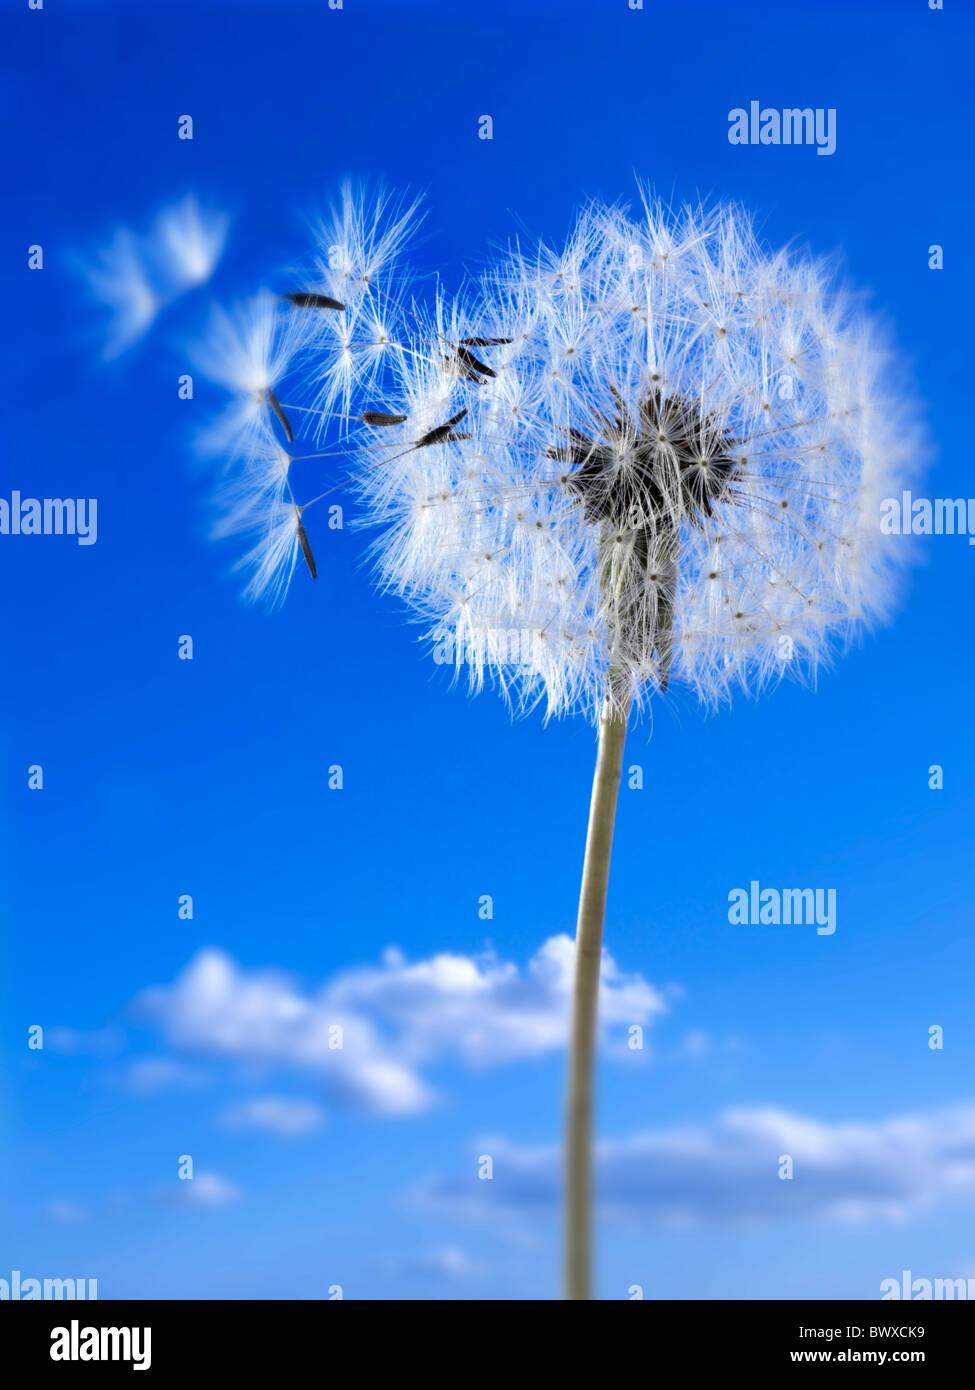 Jaramago reloj cabeza de semillas Imagen De Stock